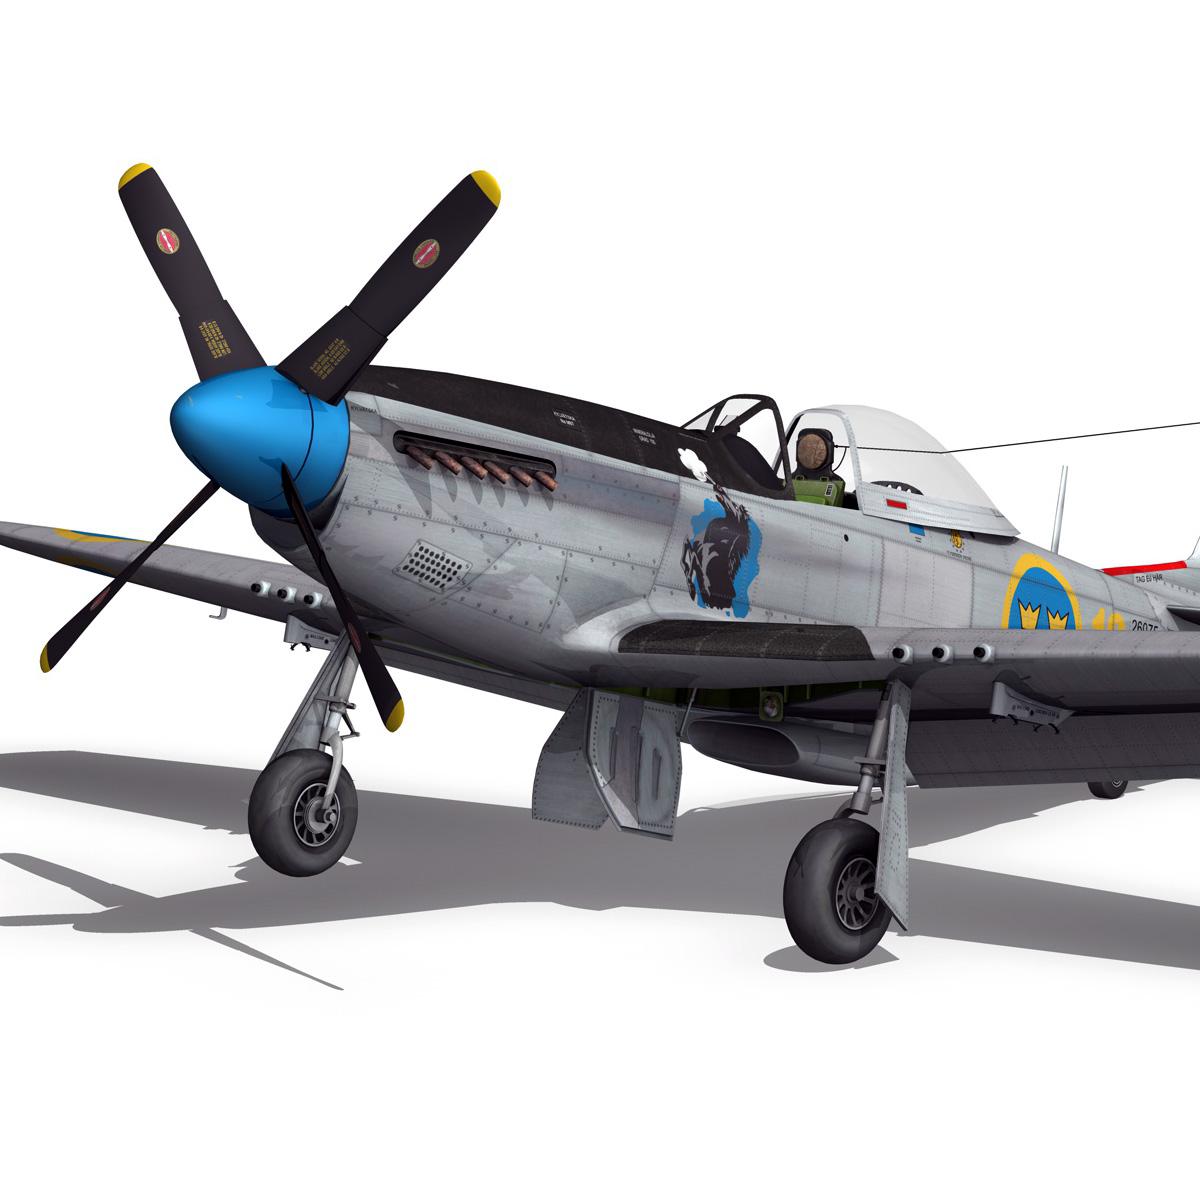 north american p-51d mustang – swedisch airforce 3d model fbx c4d lwo obj 268236